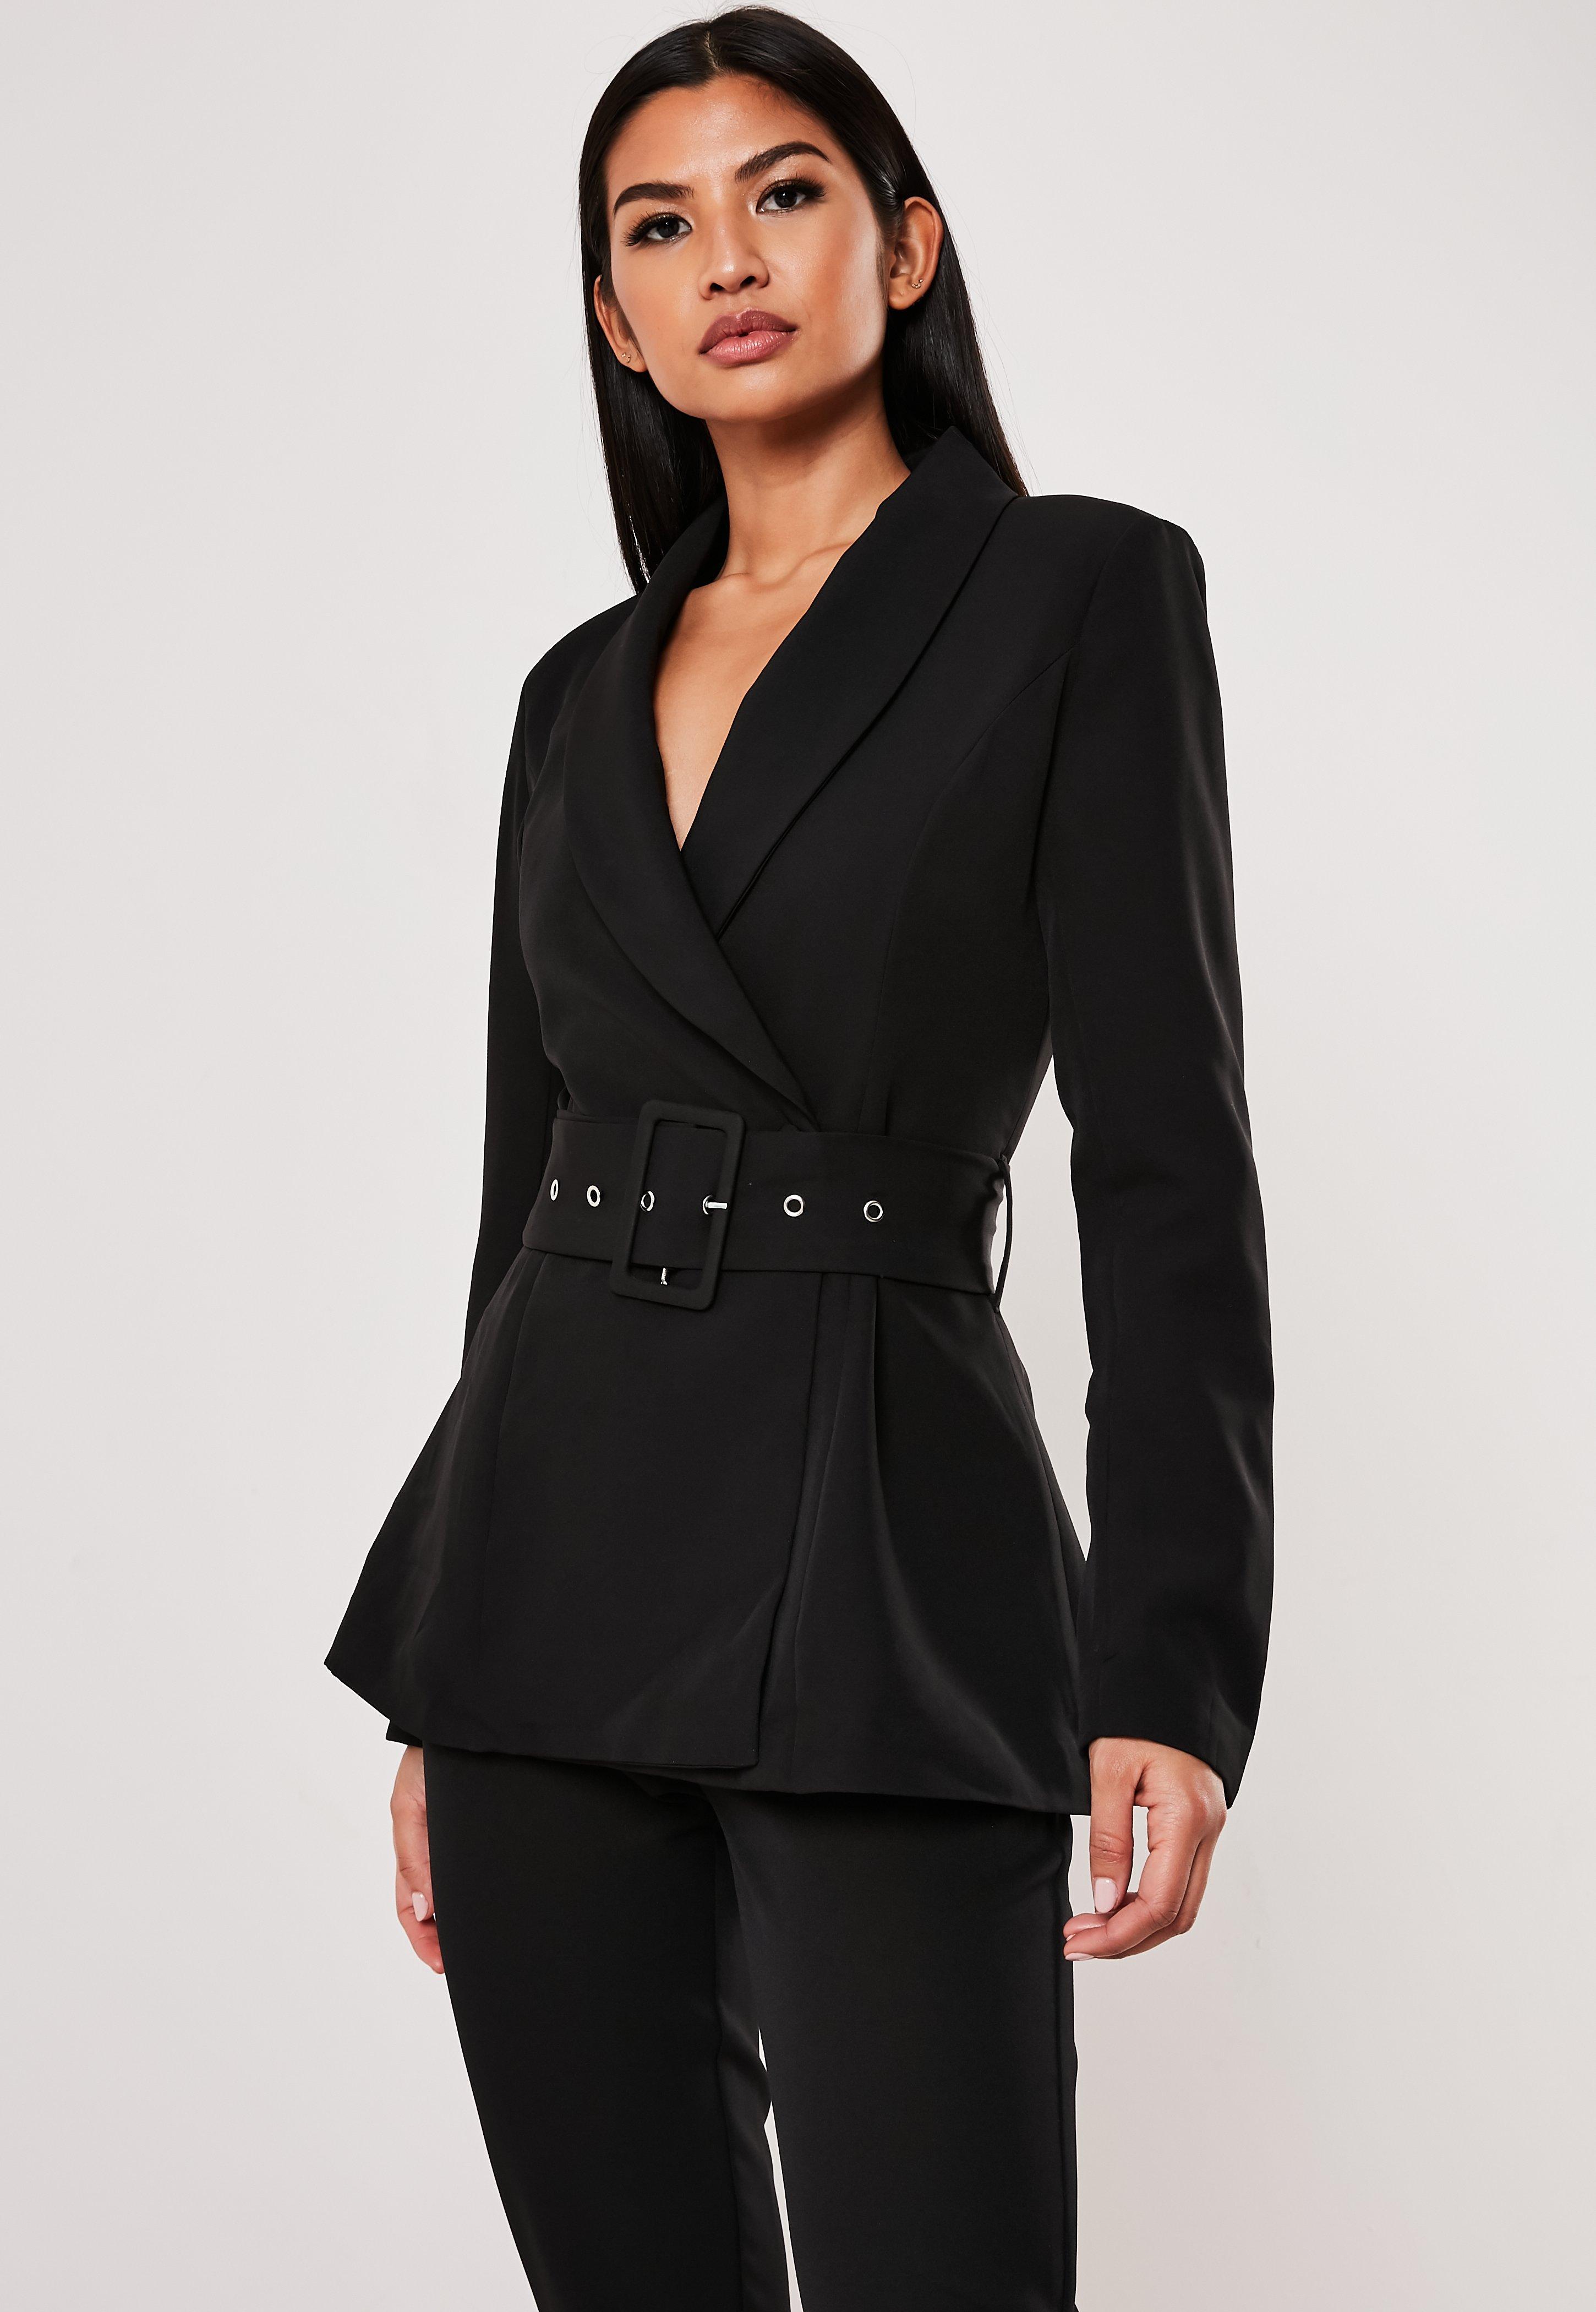 timeless design b09d0 8bfa0 Blazer - Achat blazer pour femme en ligne - Missguided